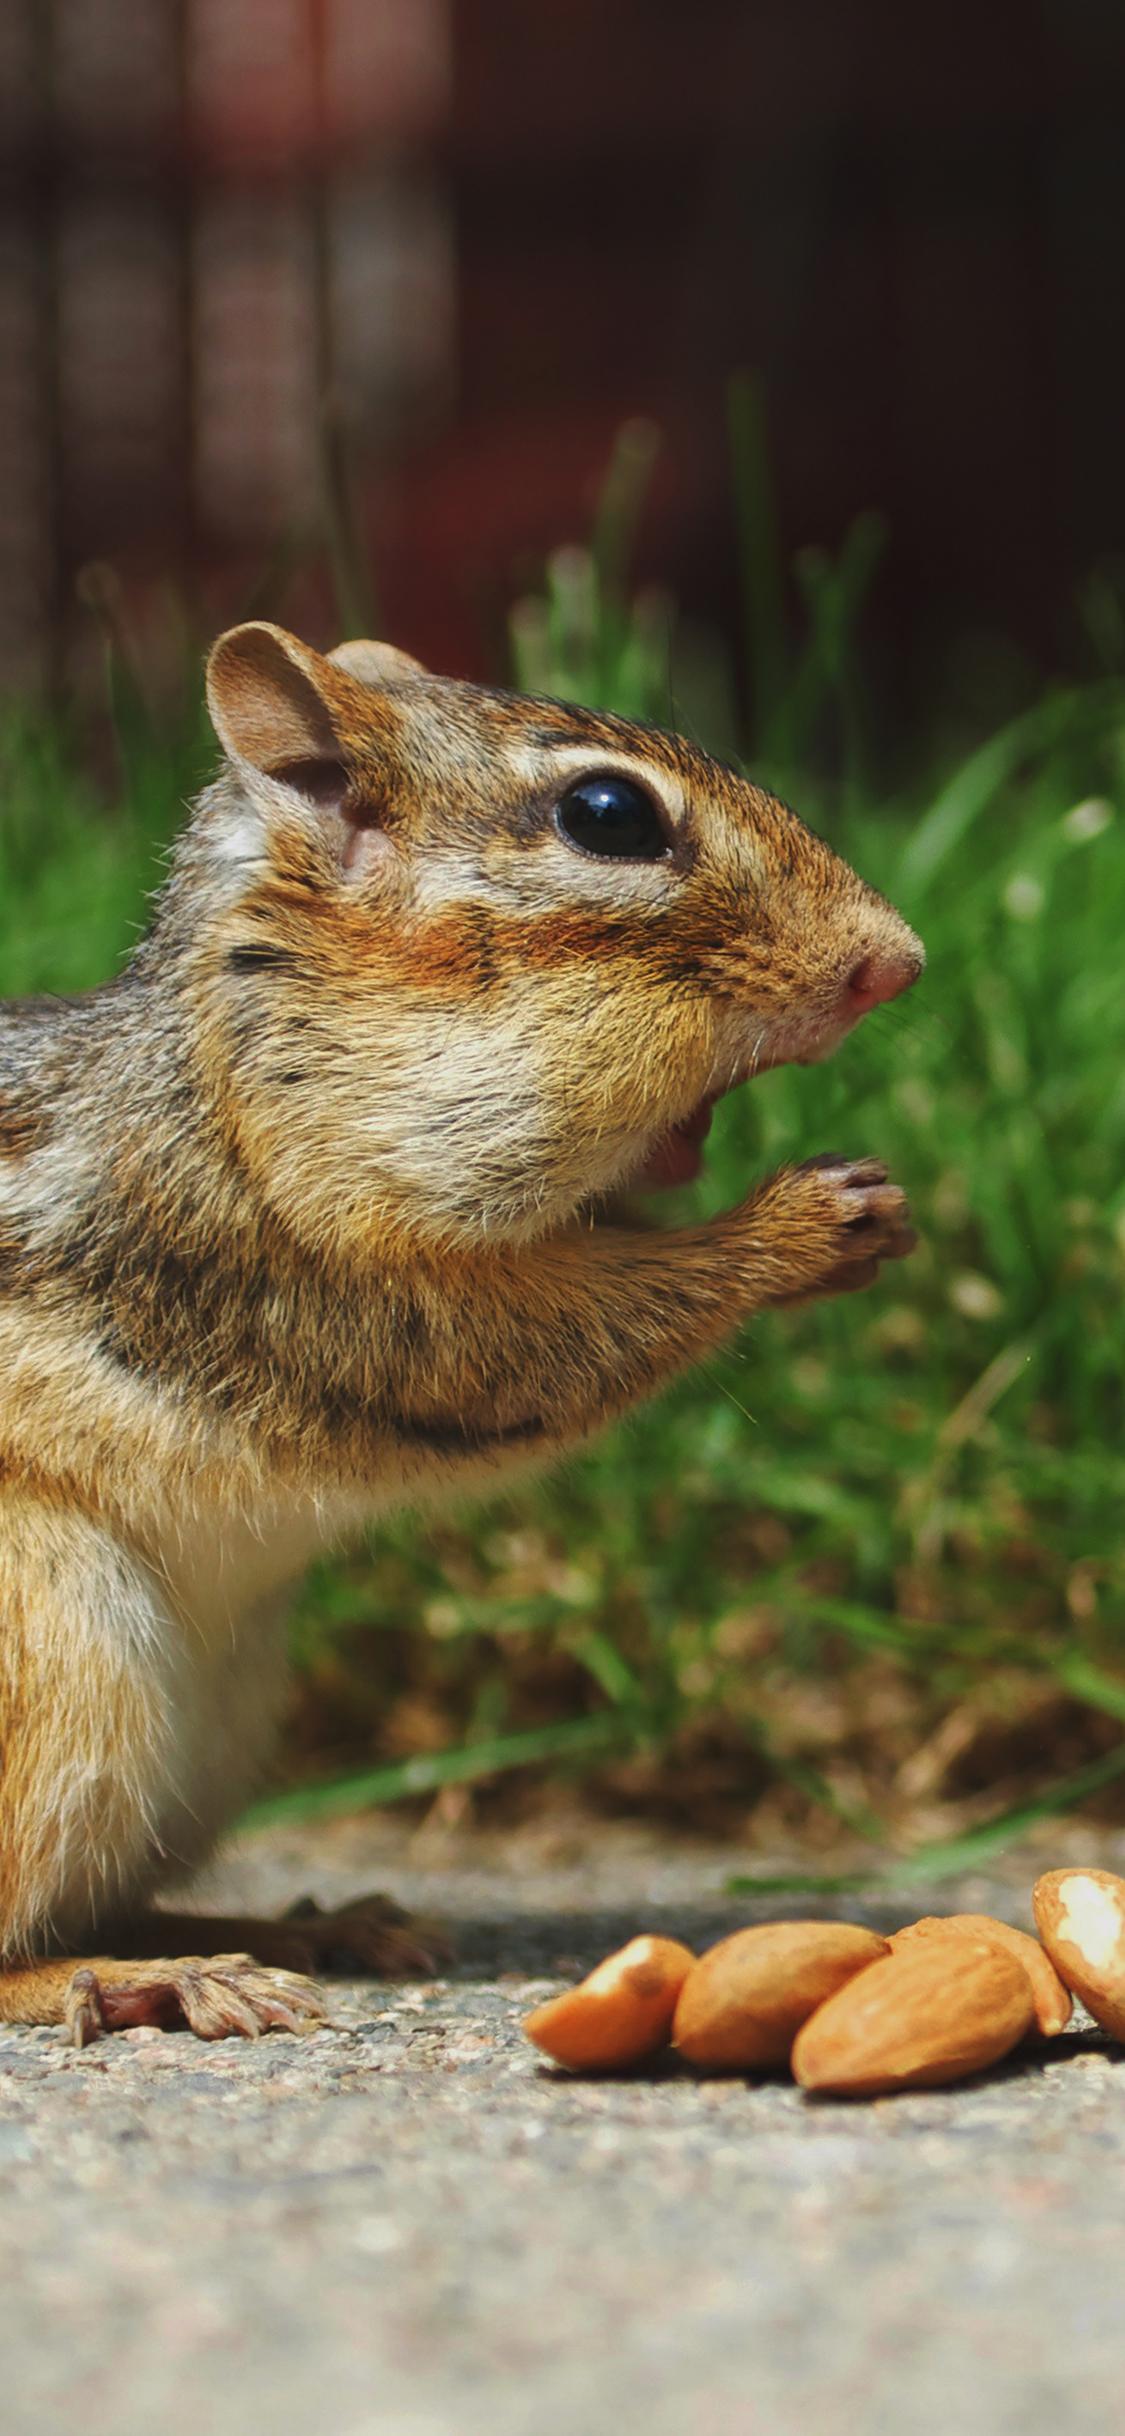 iPhoneXpapers.com-Apple-iPhone-wallpaper-mi27-chipmunk-eating-surprised-nature-animal